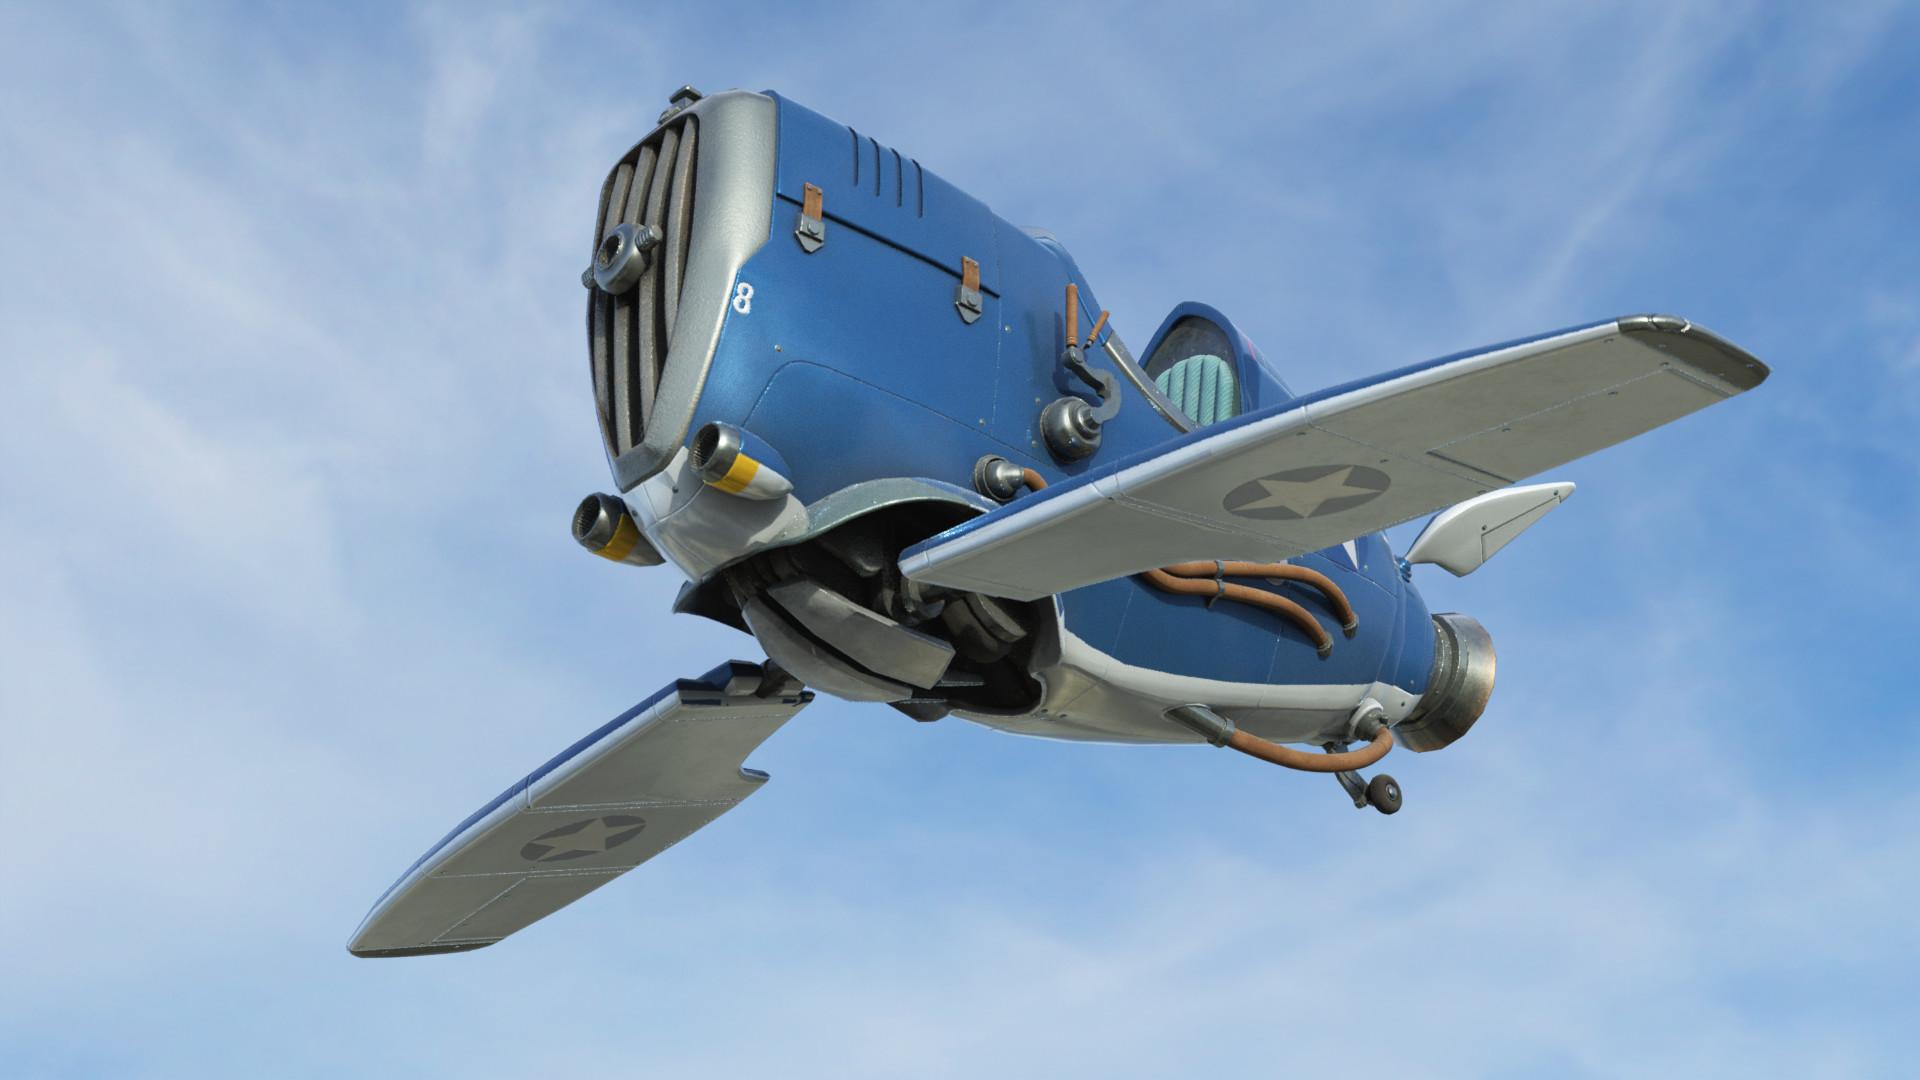 John griffiths seaplane formation render 01